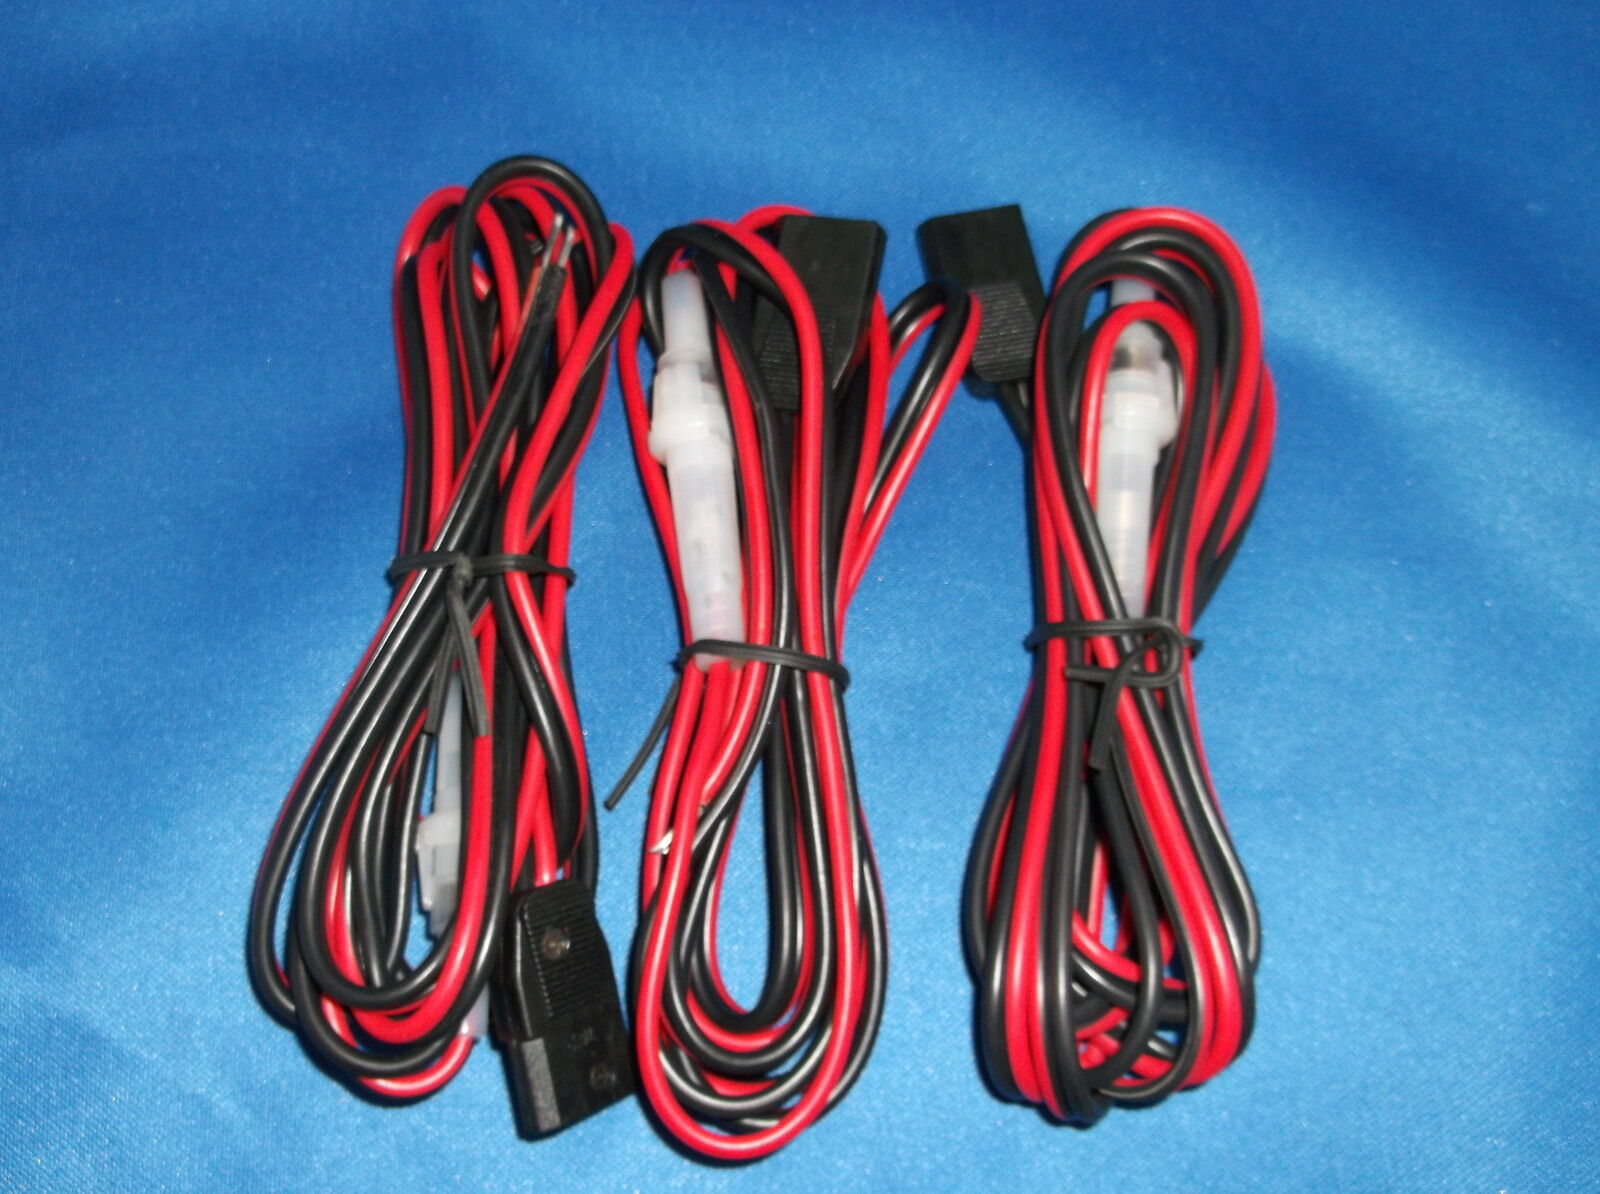 Power Cord 16 GA W 3 Pin Plug for Cobra Galaxy CB Radios Workman ...